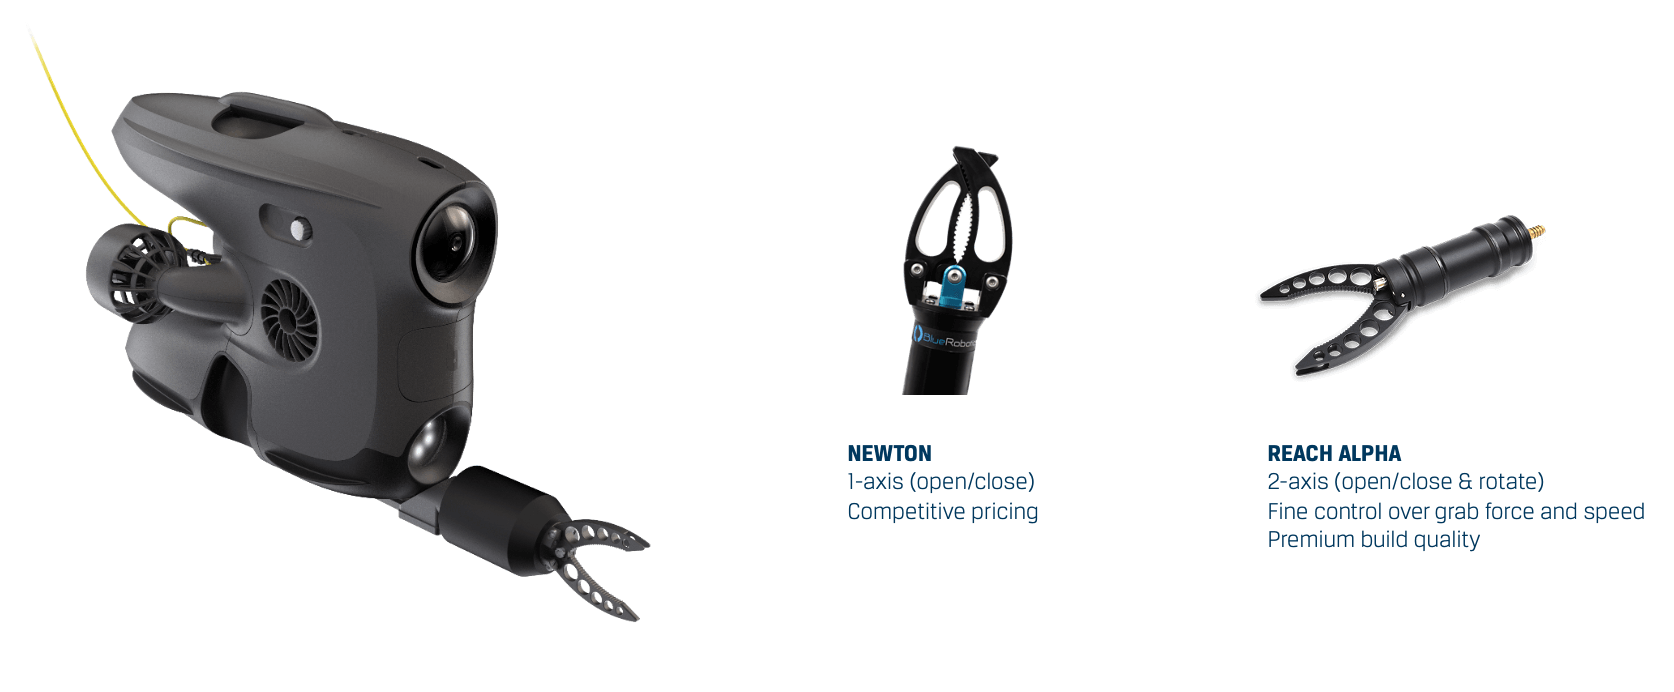 The X3 can be configured with two gripper alternatives, the BlueRobotics Newton gripper, or the BlueprintLabs Reach Alpha gripper.